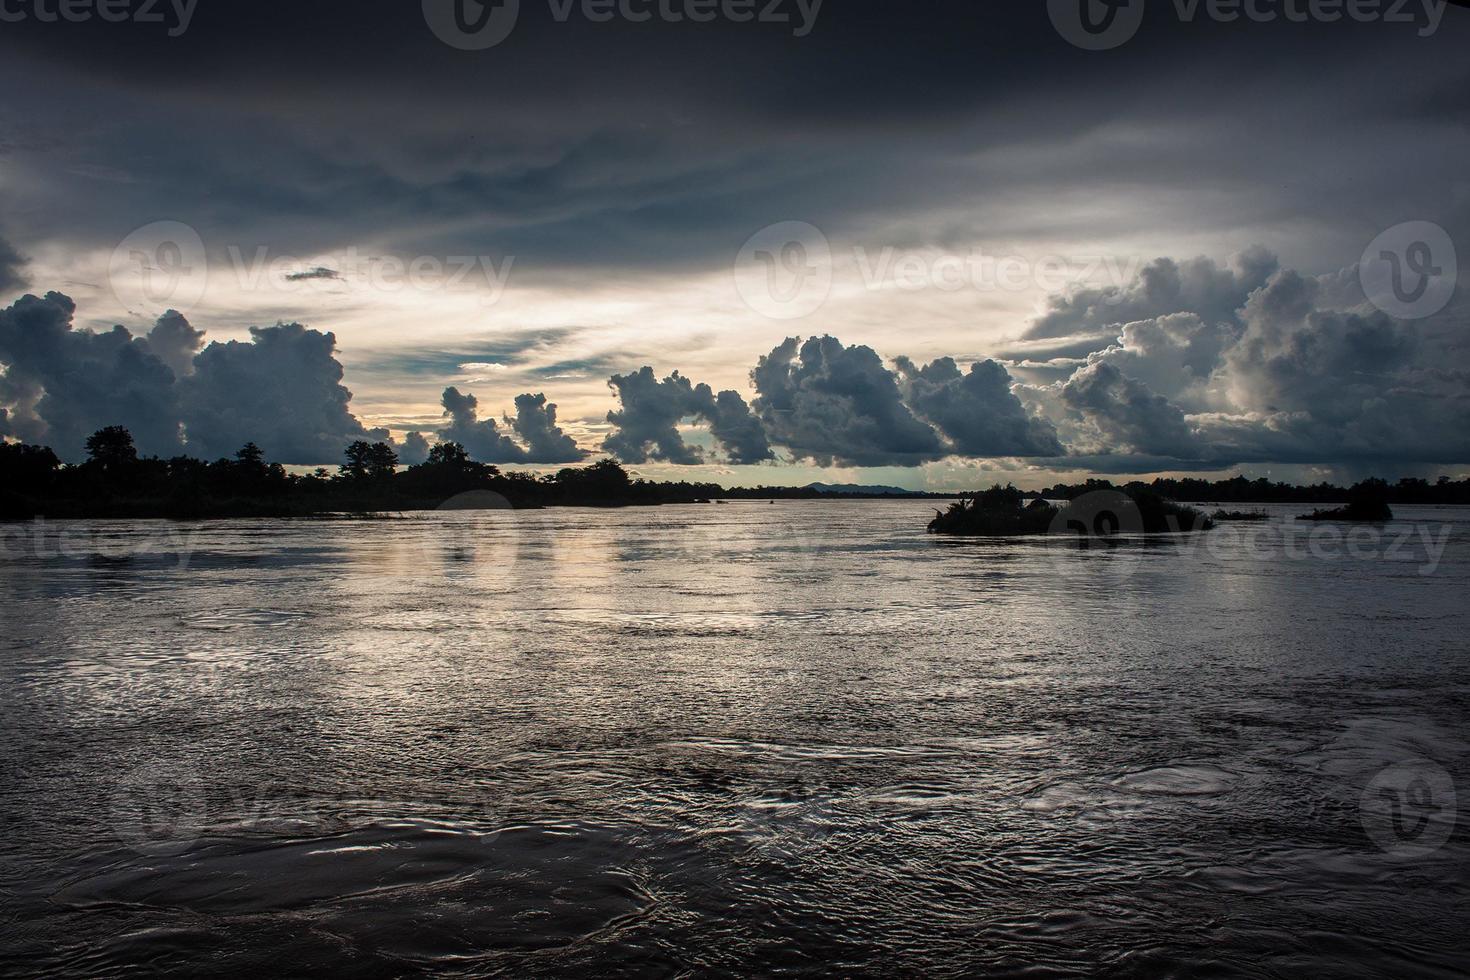 tramonto sul fiume mekong foto